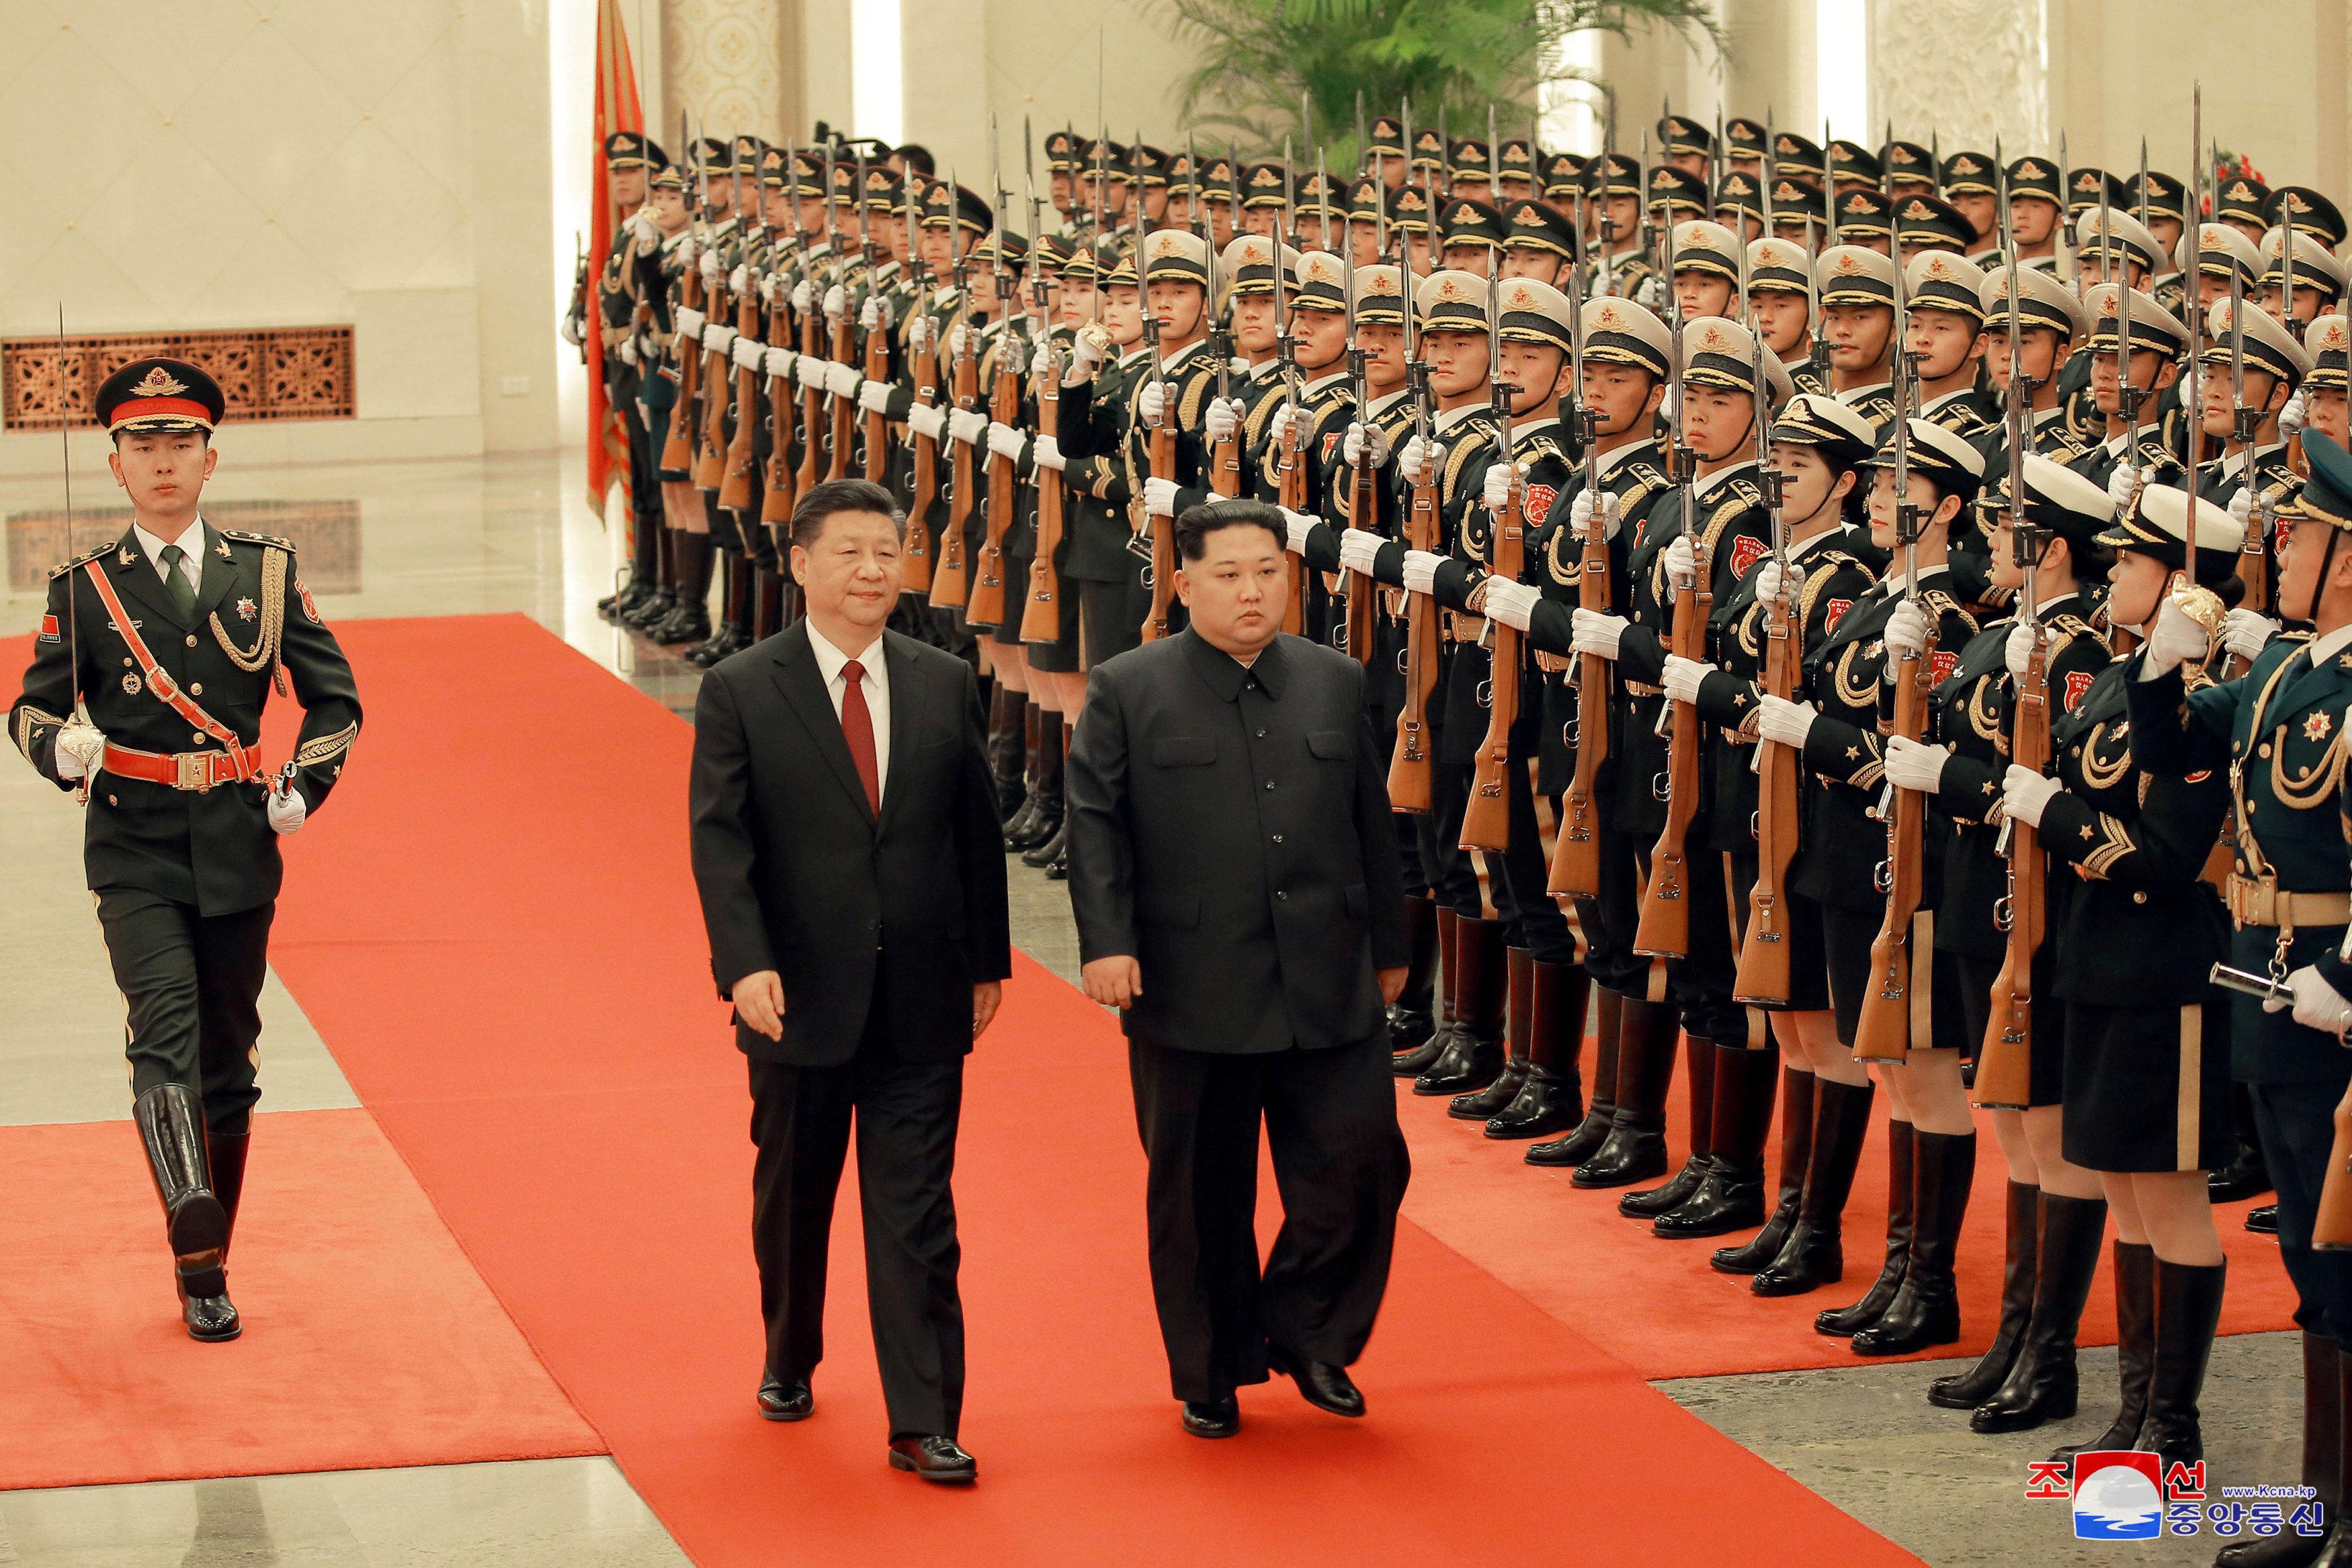 Kim Jong Un y Xi Jinping pasan revista a las tropas formadas para recibir al dictador norcoreano